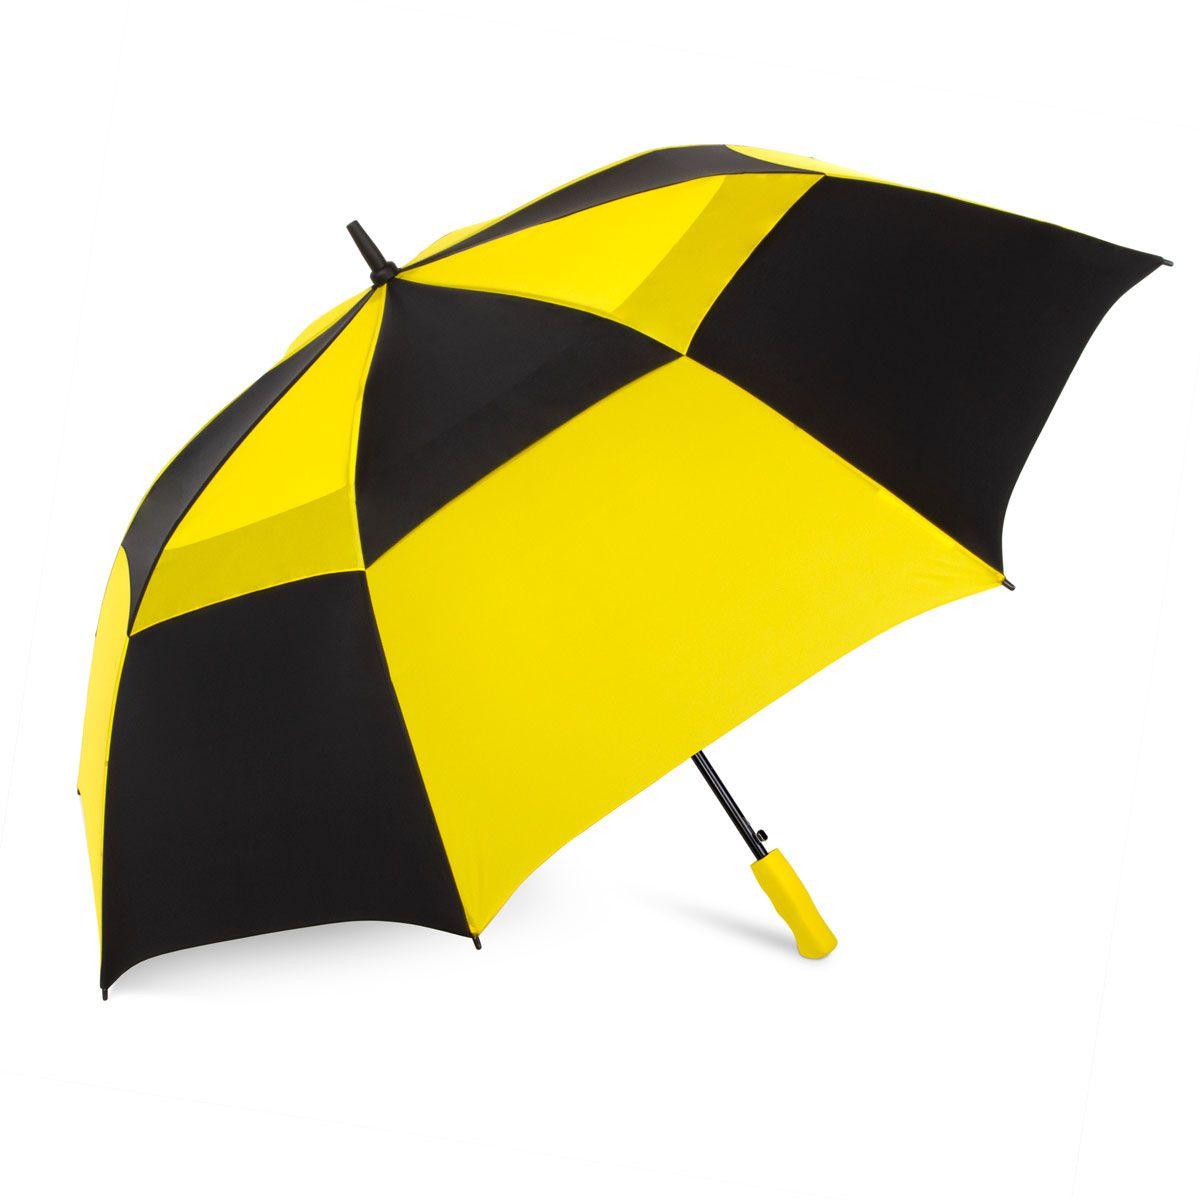 99311c0f7ebd WindJammer® Vented Auto Open Golf Umbrella - Promotional - ShedRain ...